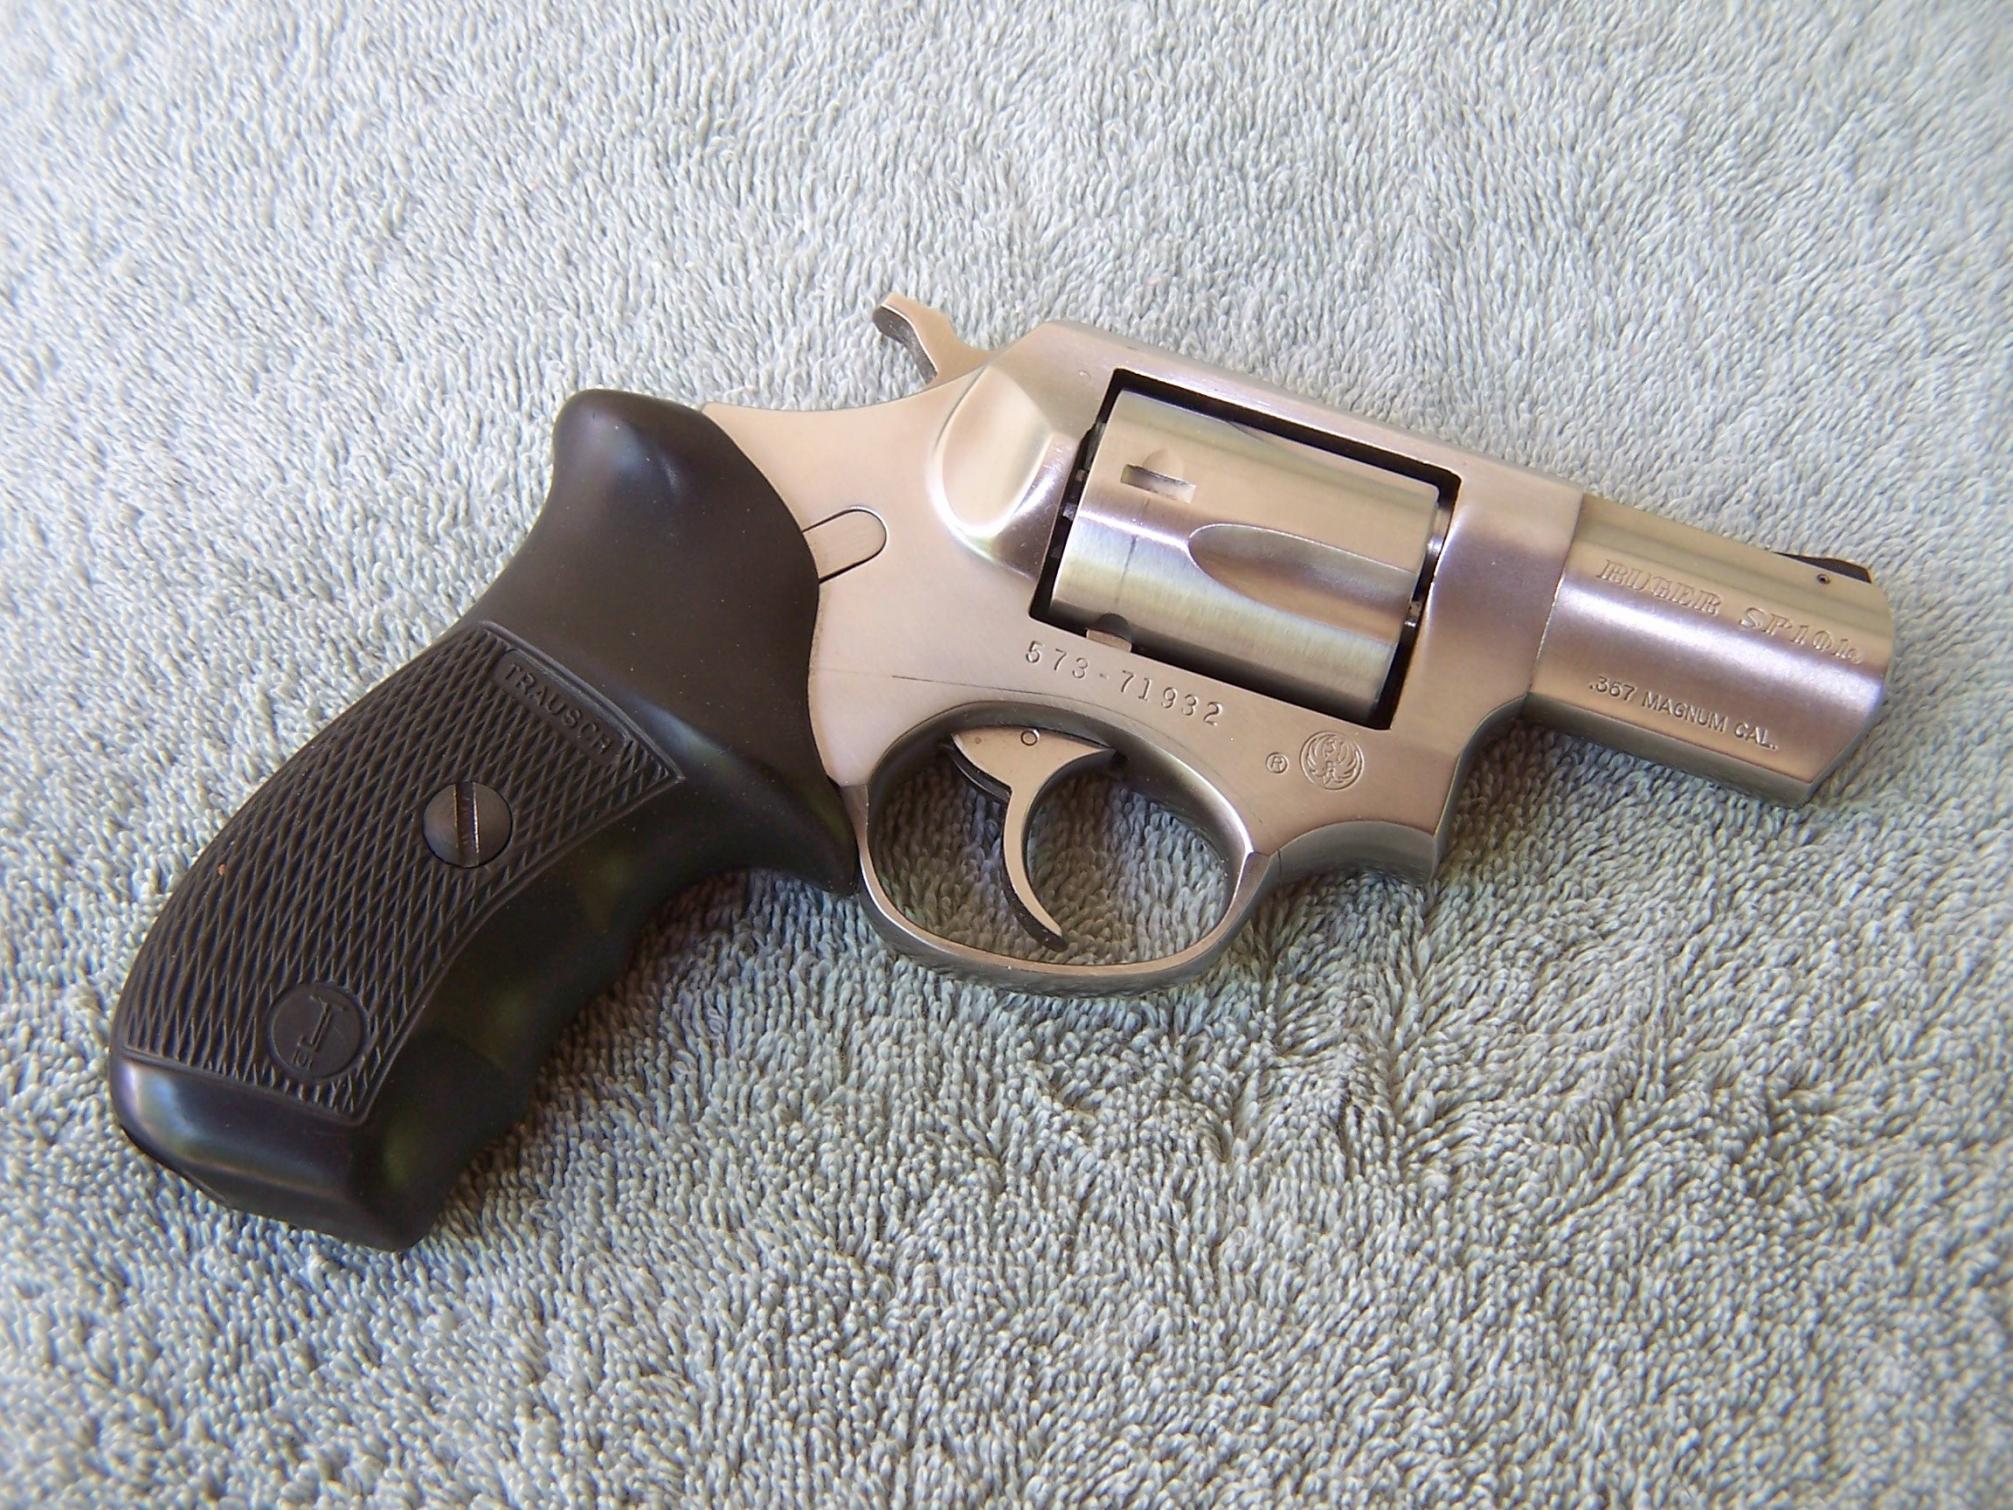 Ruger VS S&W Revolvers-573-71932.jpg